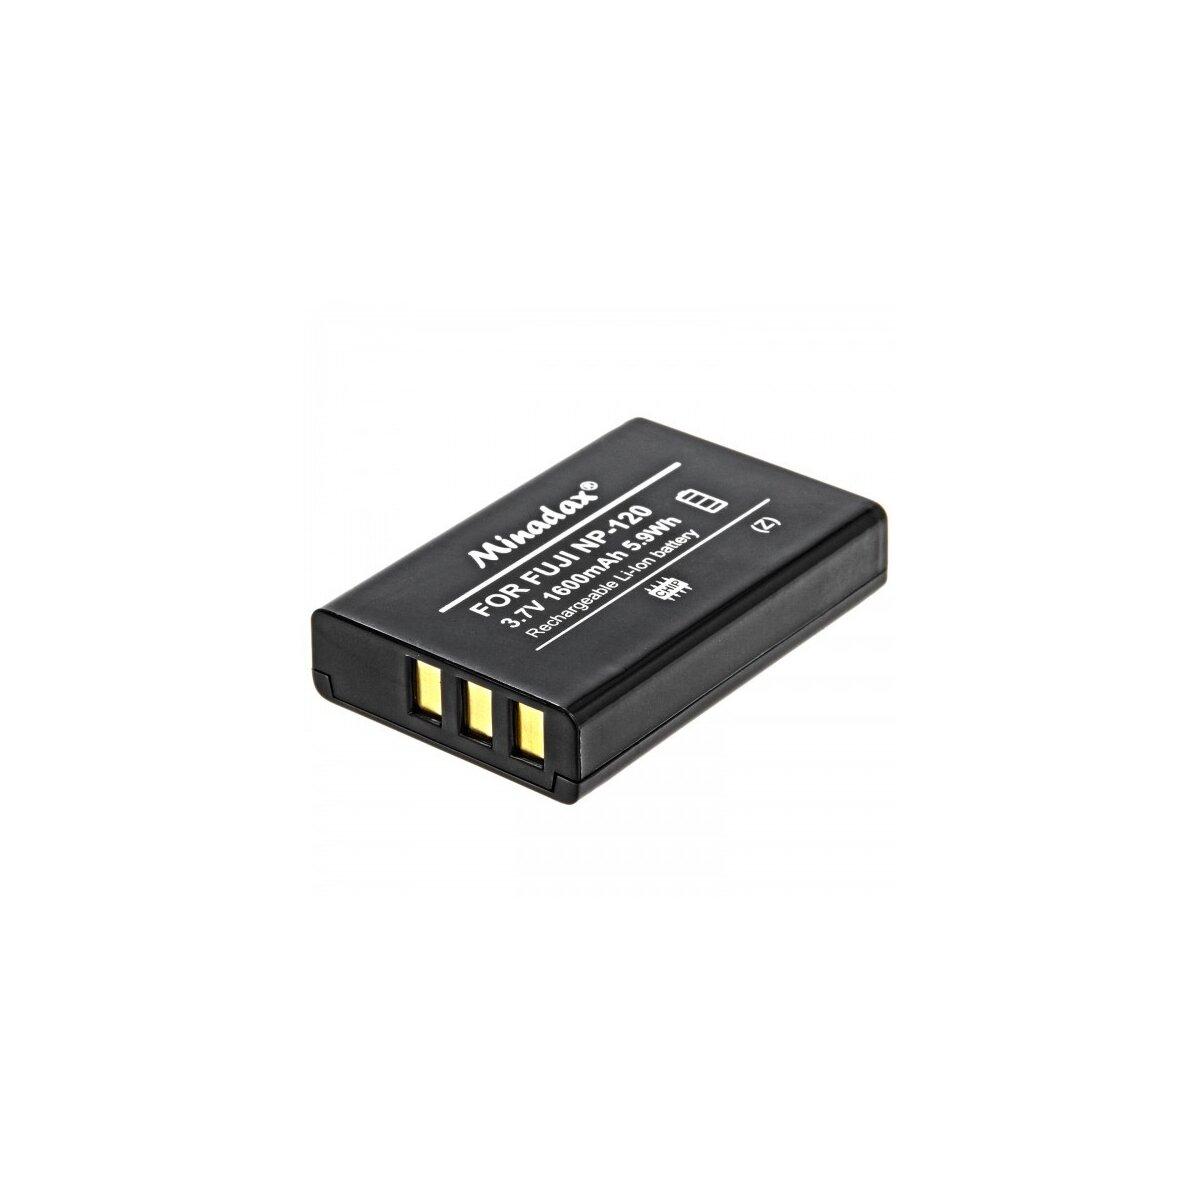 Minadax Qualitätsakku mit echten 1600 mAh kompatibel für FujiFilm FinePix 603, F10, F11, M603, Ersatz für NP-120 - Intelligentes Akkusystem mit Chip